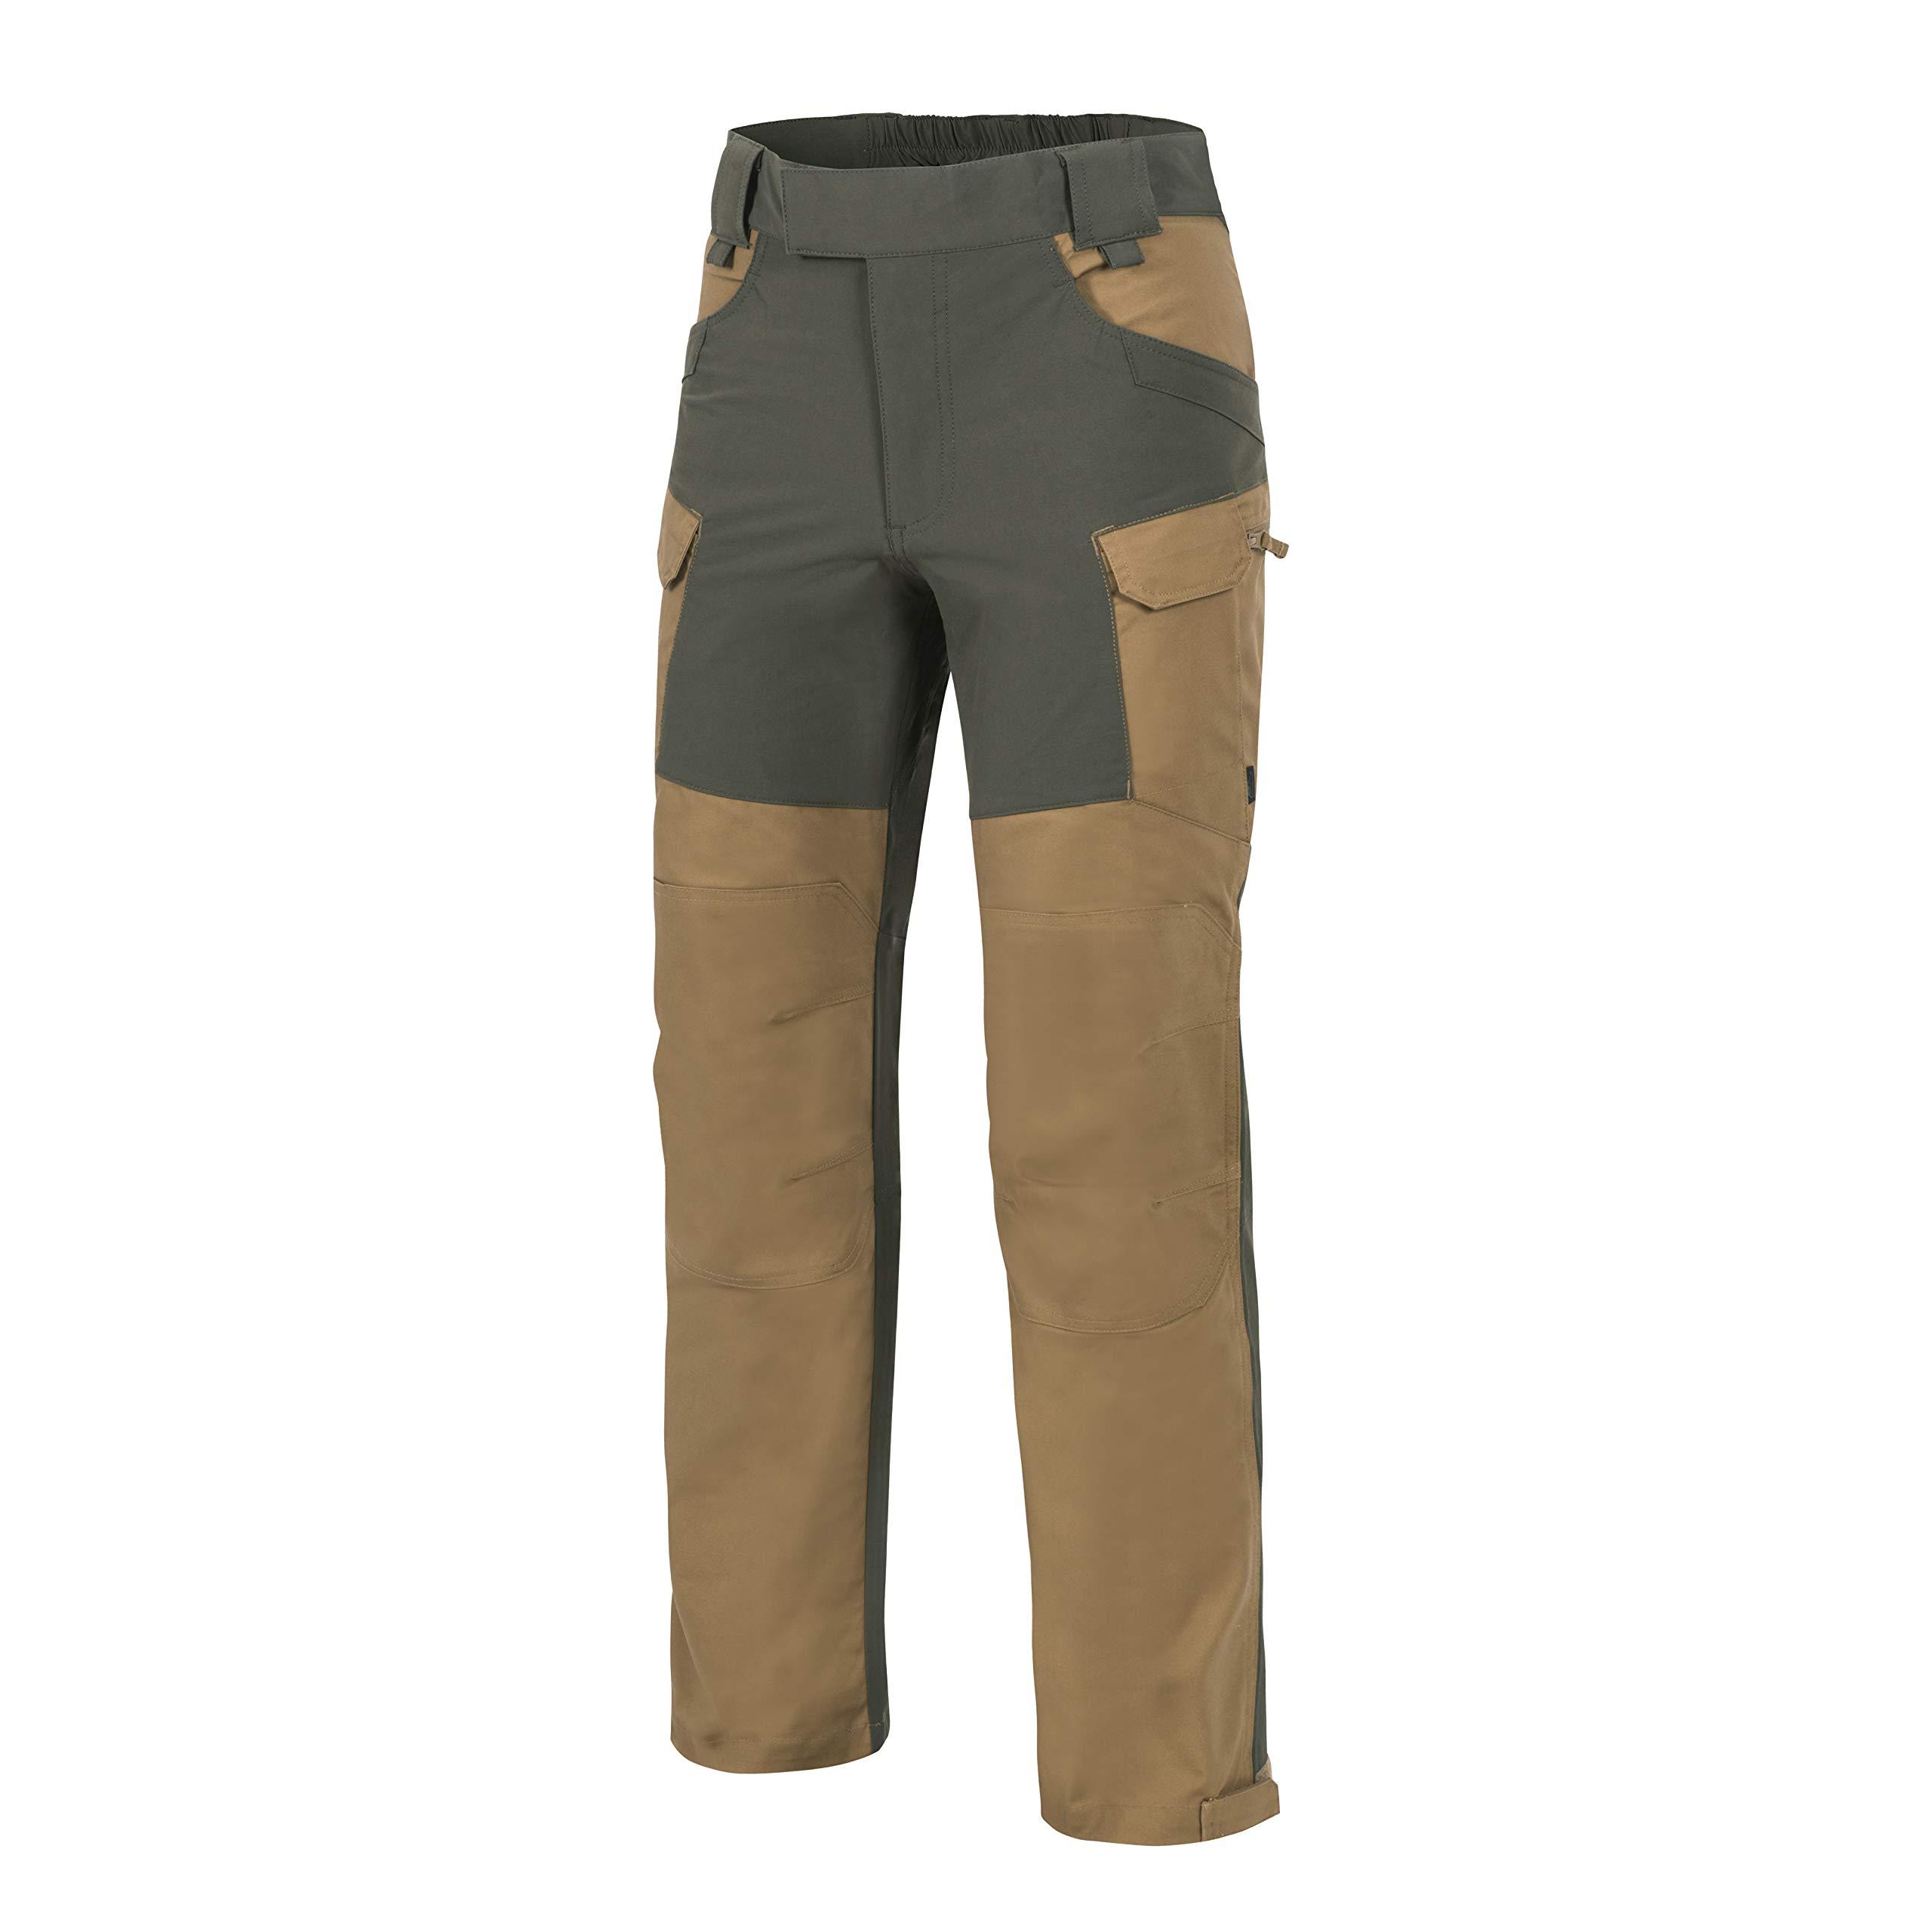 Helikon-Tex Outback Line, HOP Hybrid Outback Pants, DuraCanvas VersaStretch Coyote Brown/Taiga Green Waist 36 Length 32